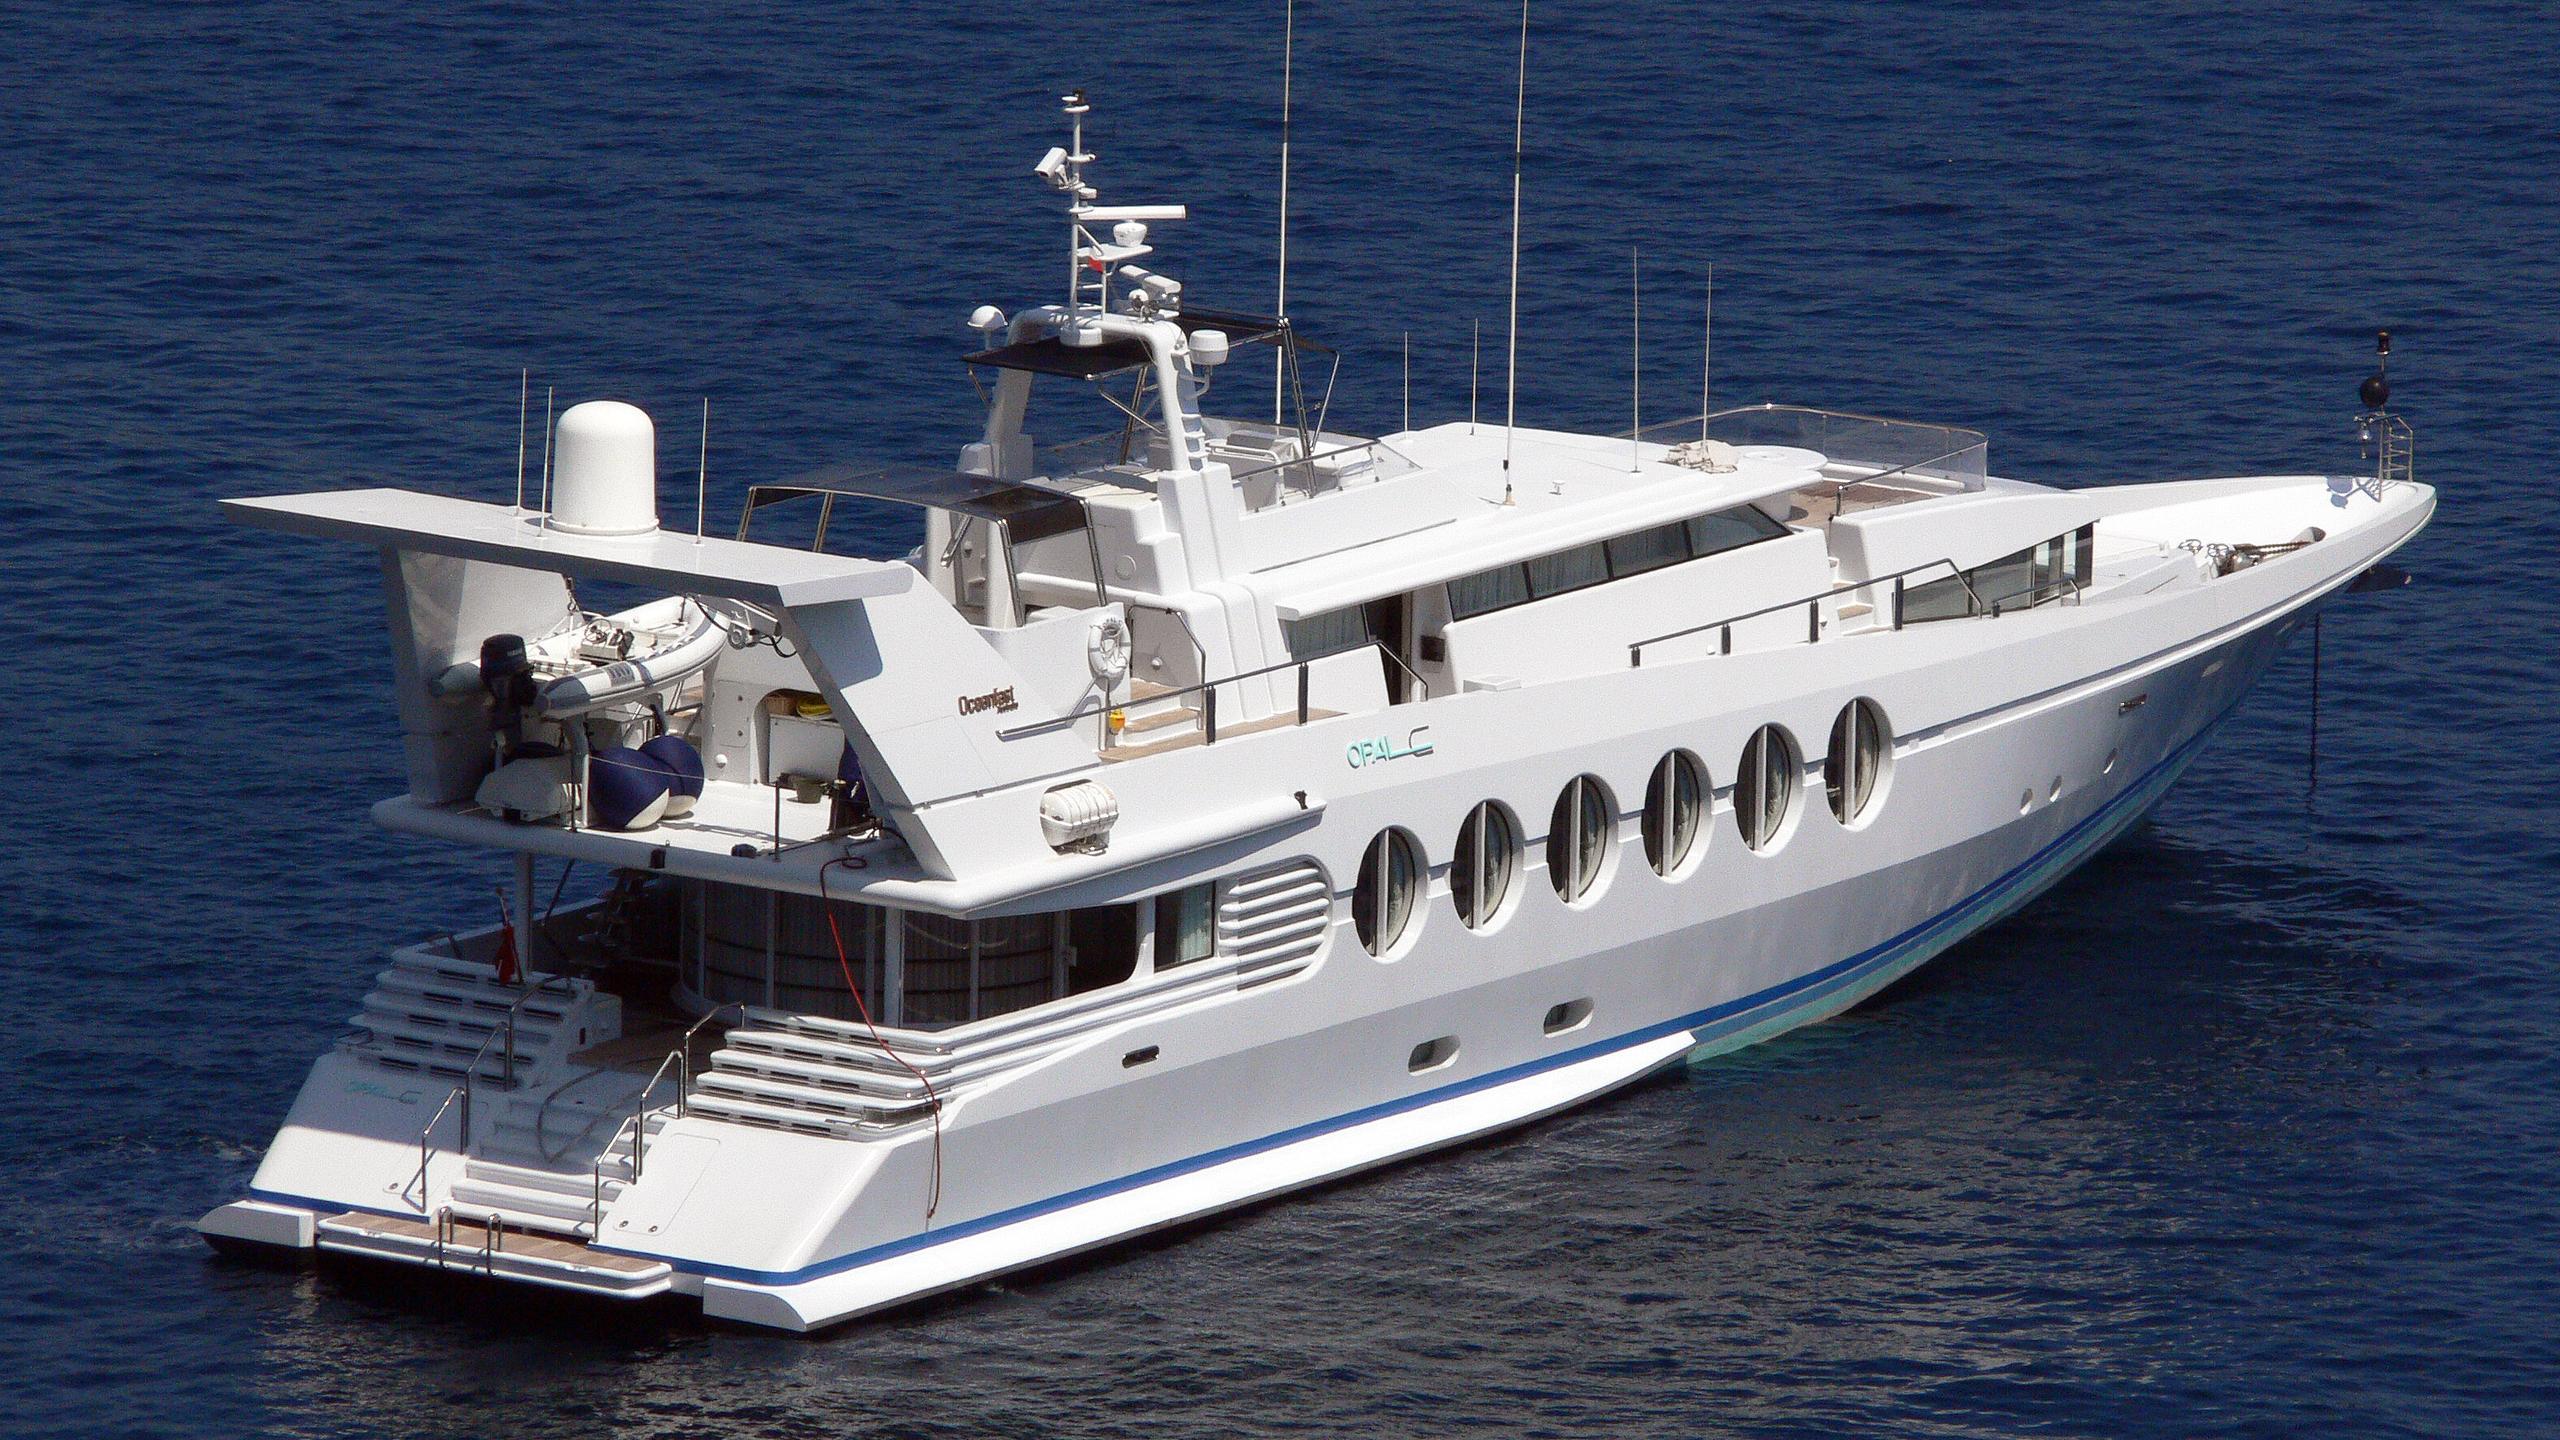 lady-arraya-motor-yacht-oceanfast-1990-40m-half-profile